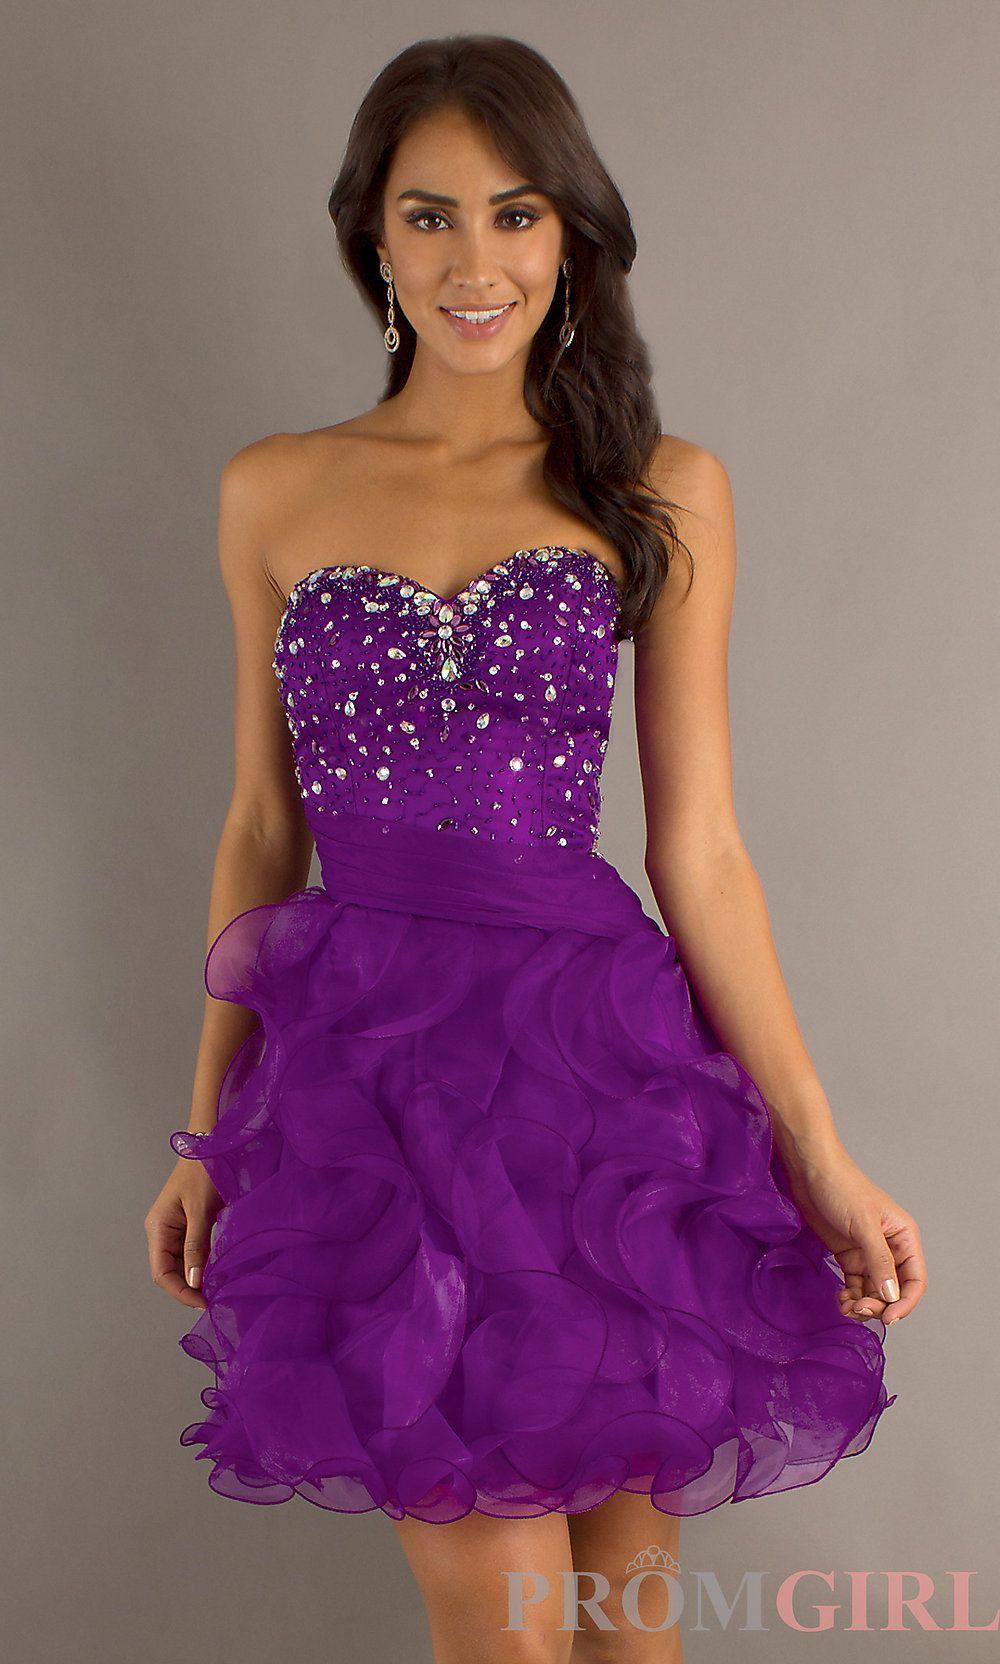 Pin by mae mcgee on prom stuffs pinterest short purple prom